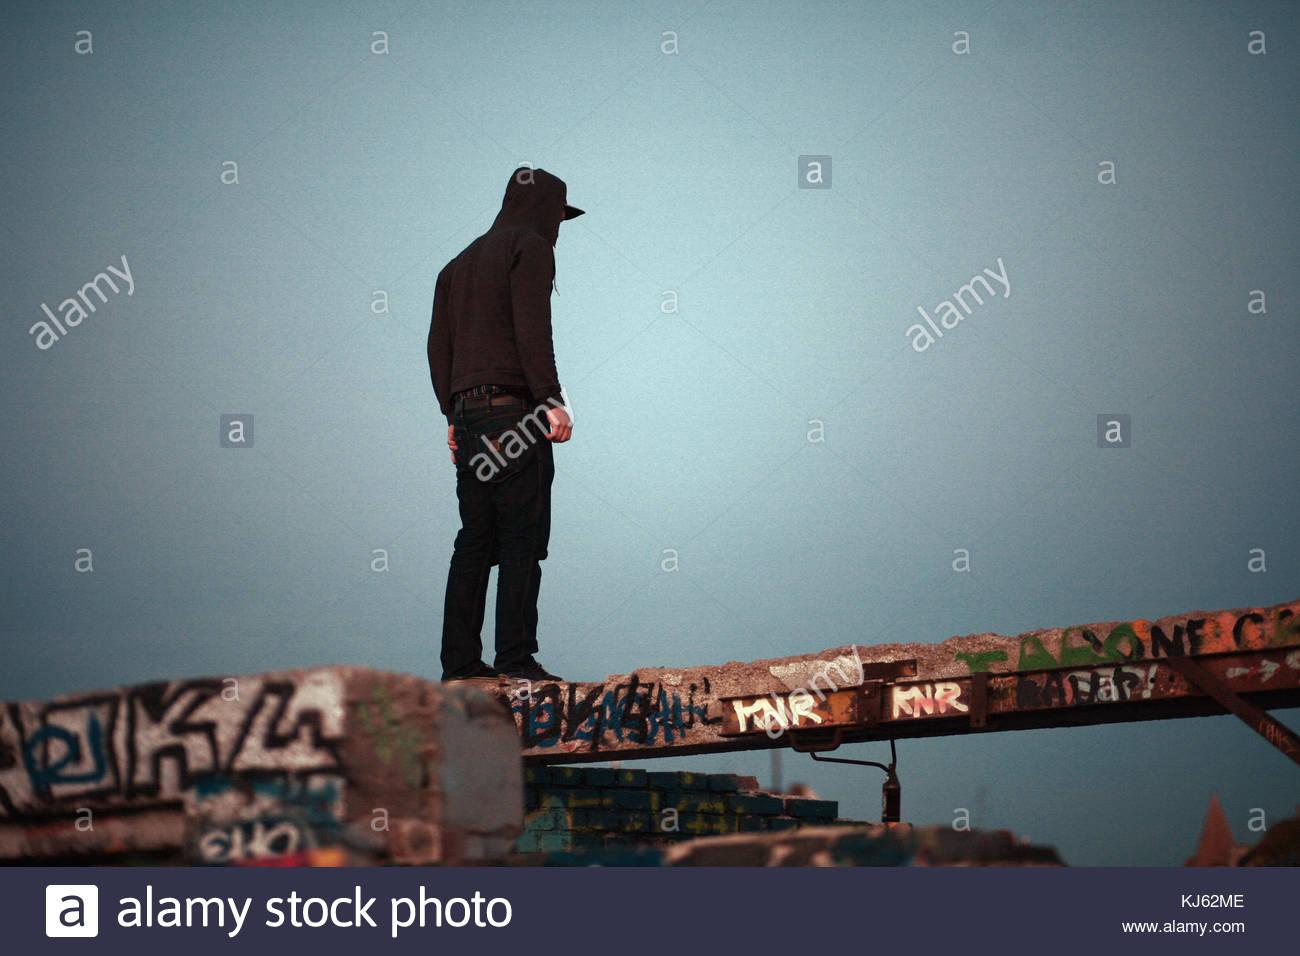 Hombre adulto joven en graffiti caminar Imagen De Stock